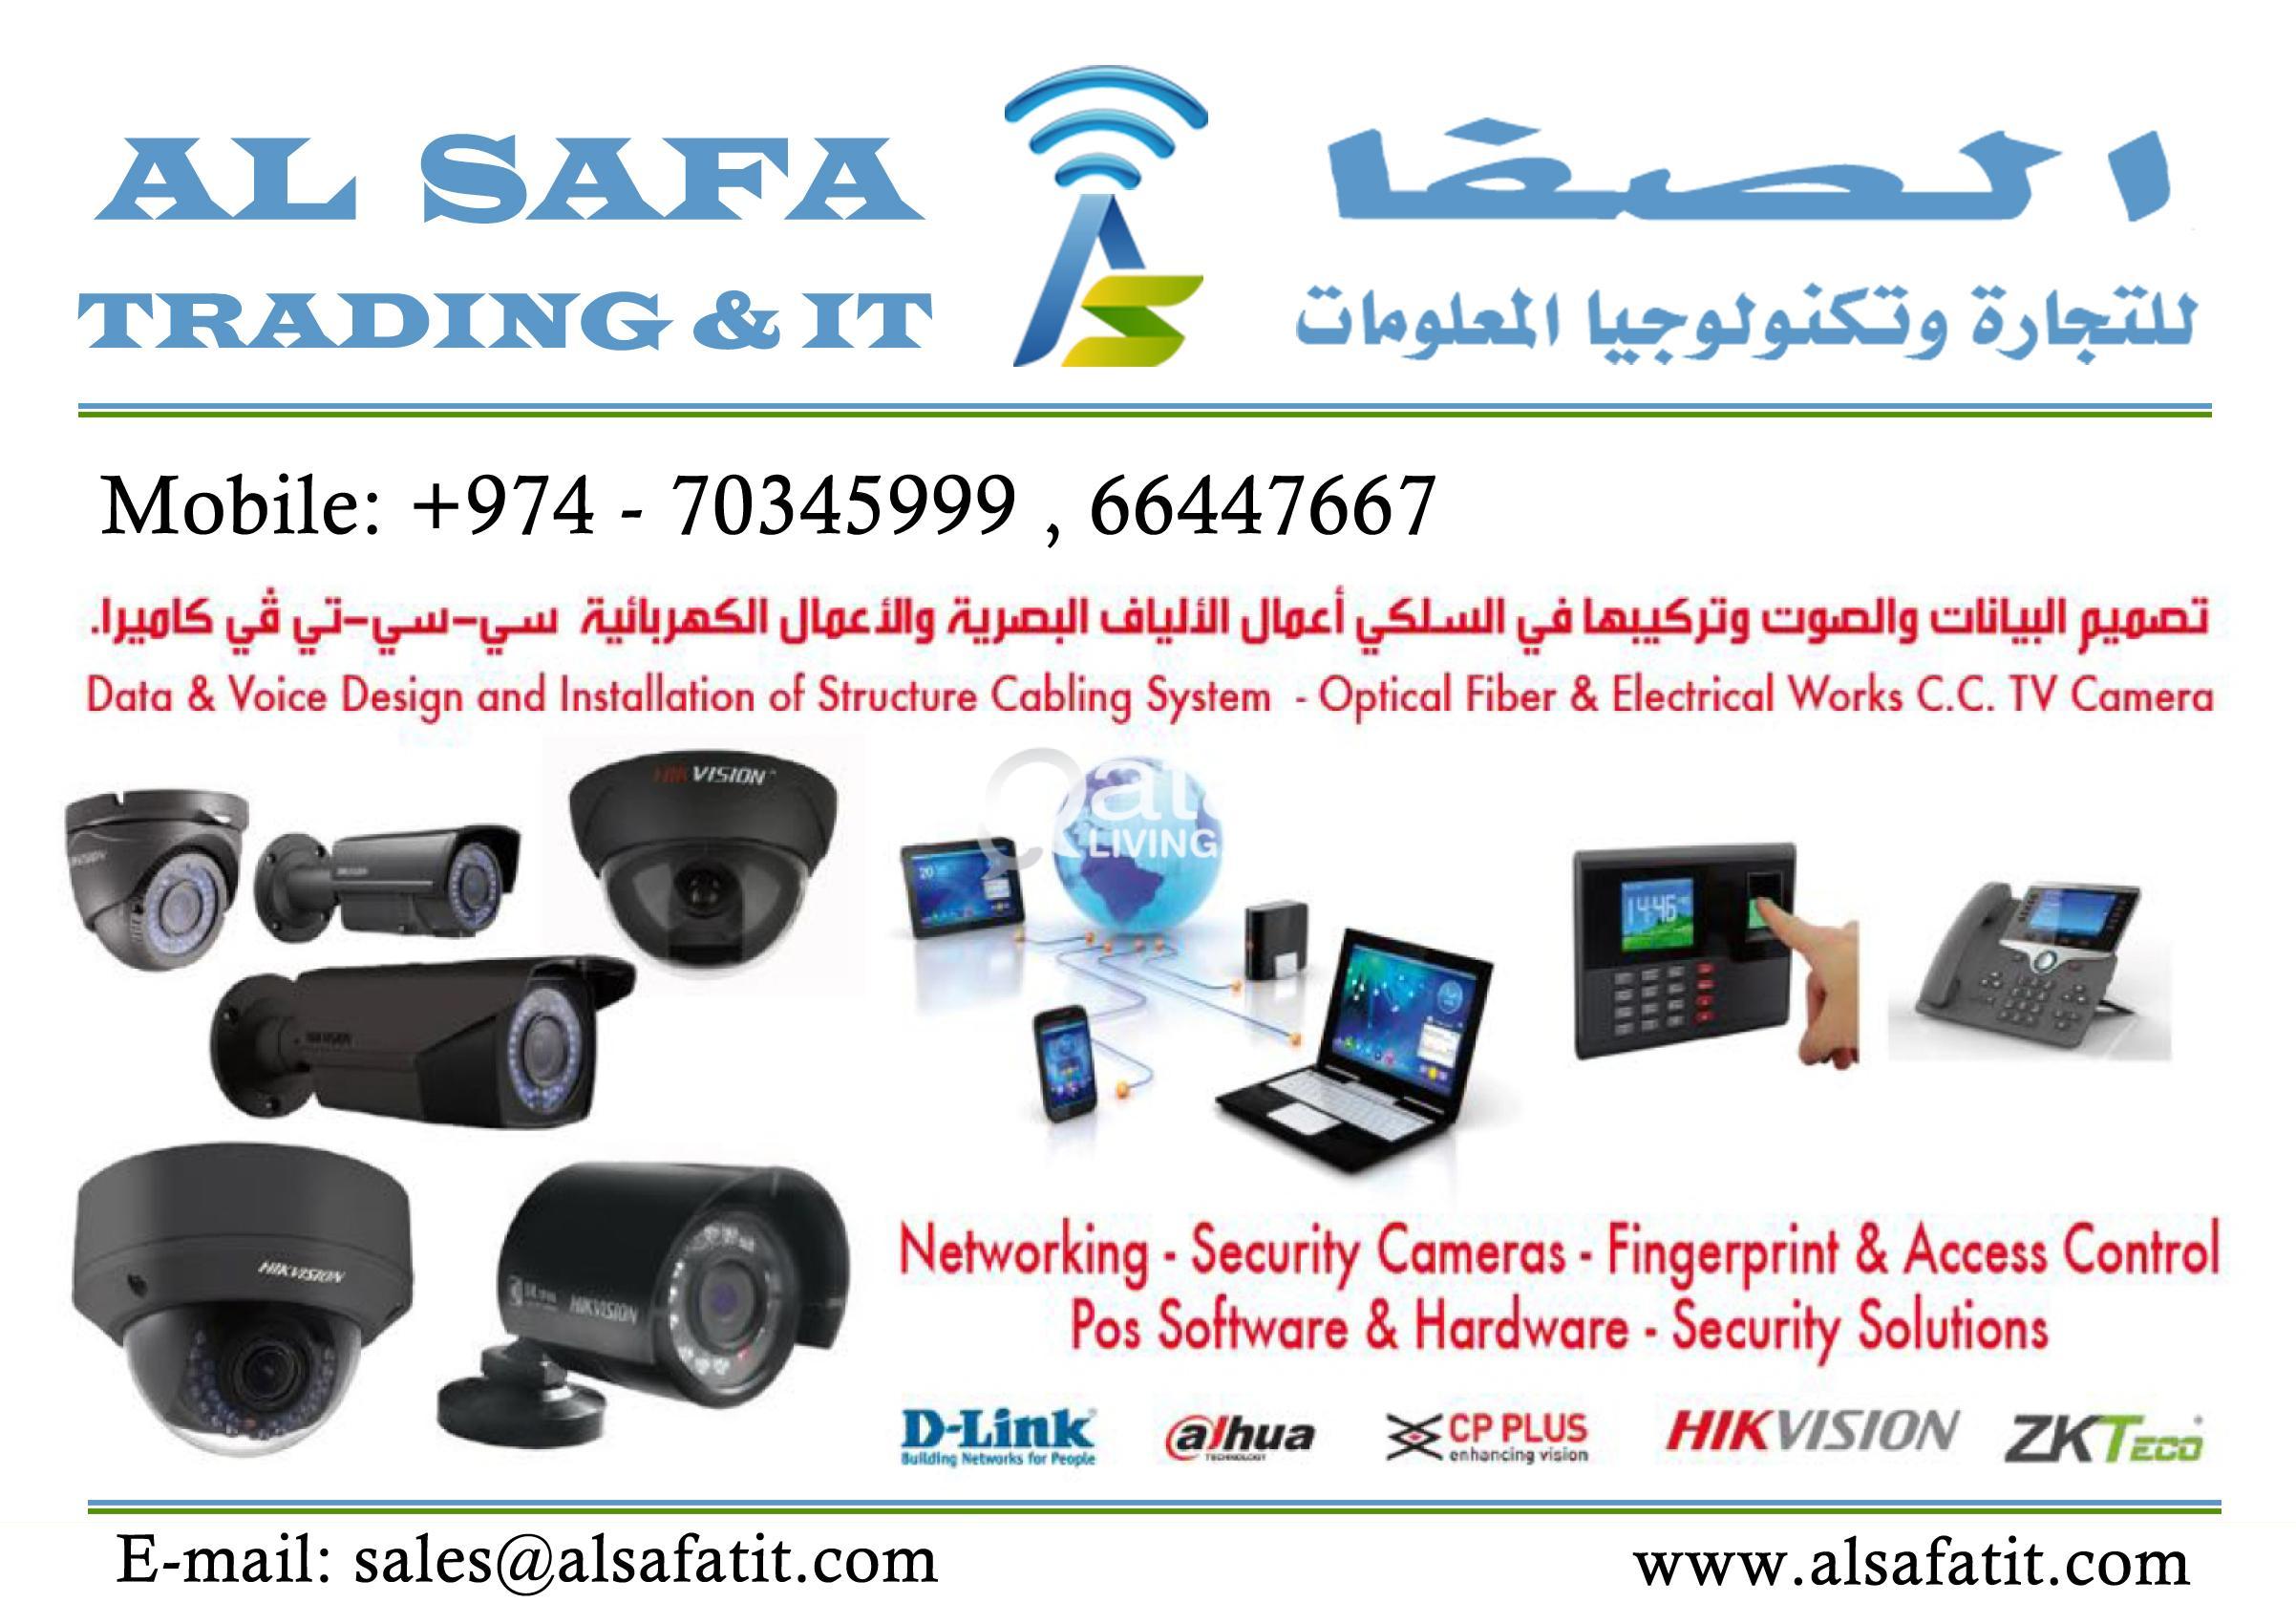 CCTV Camera|Data Cabling|Optical Fiber|Attendance |Access Control m